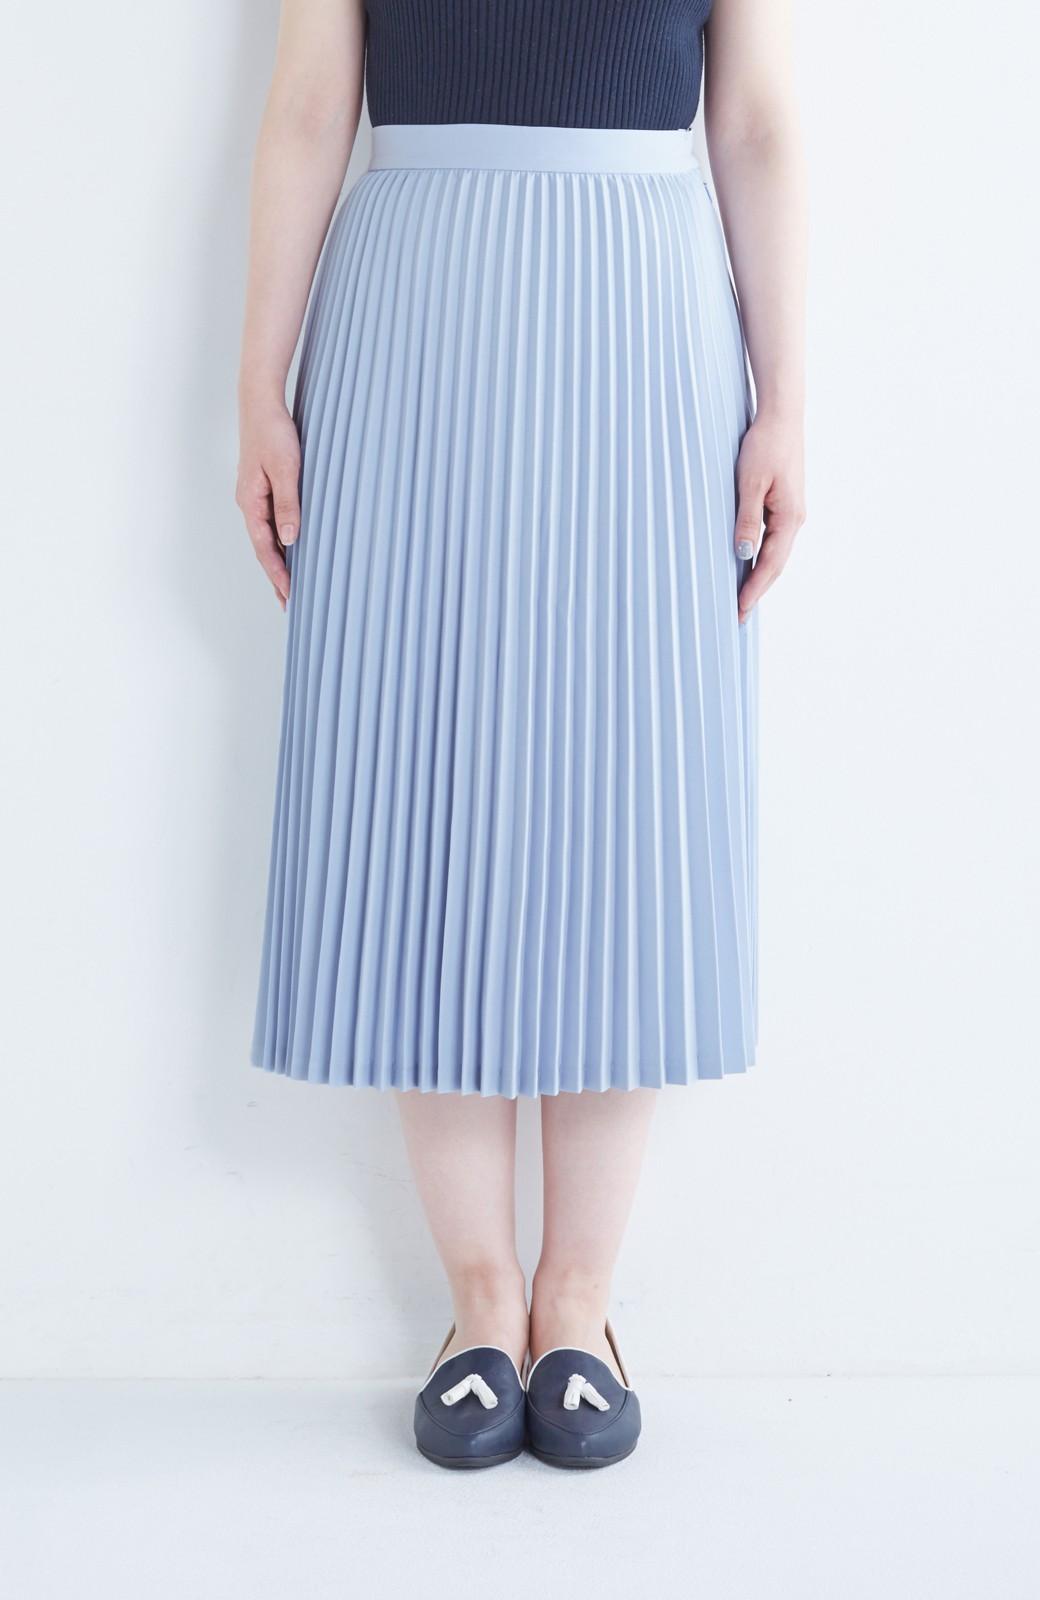 haco! 【mer11月号掲載】折り目正しい大人のためのプリーツスカート by que made me <サックスブルー>の商品写真8